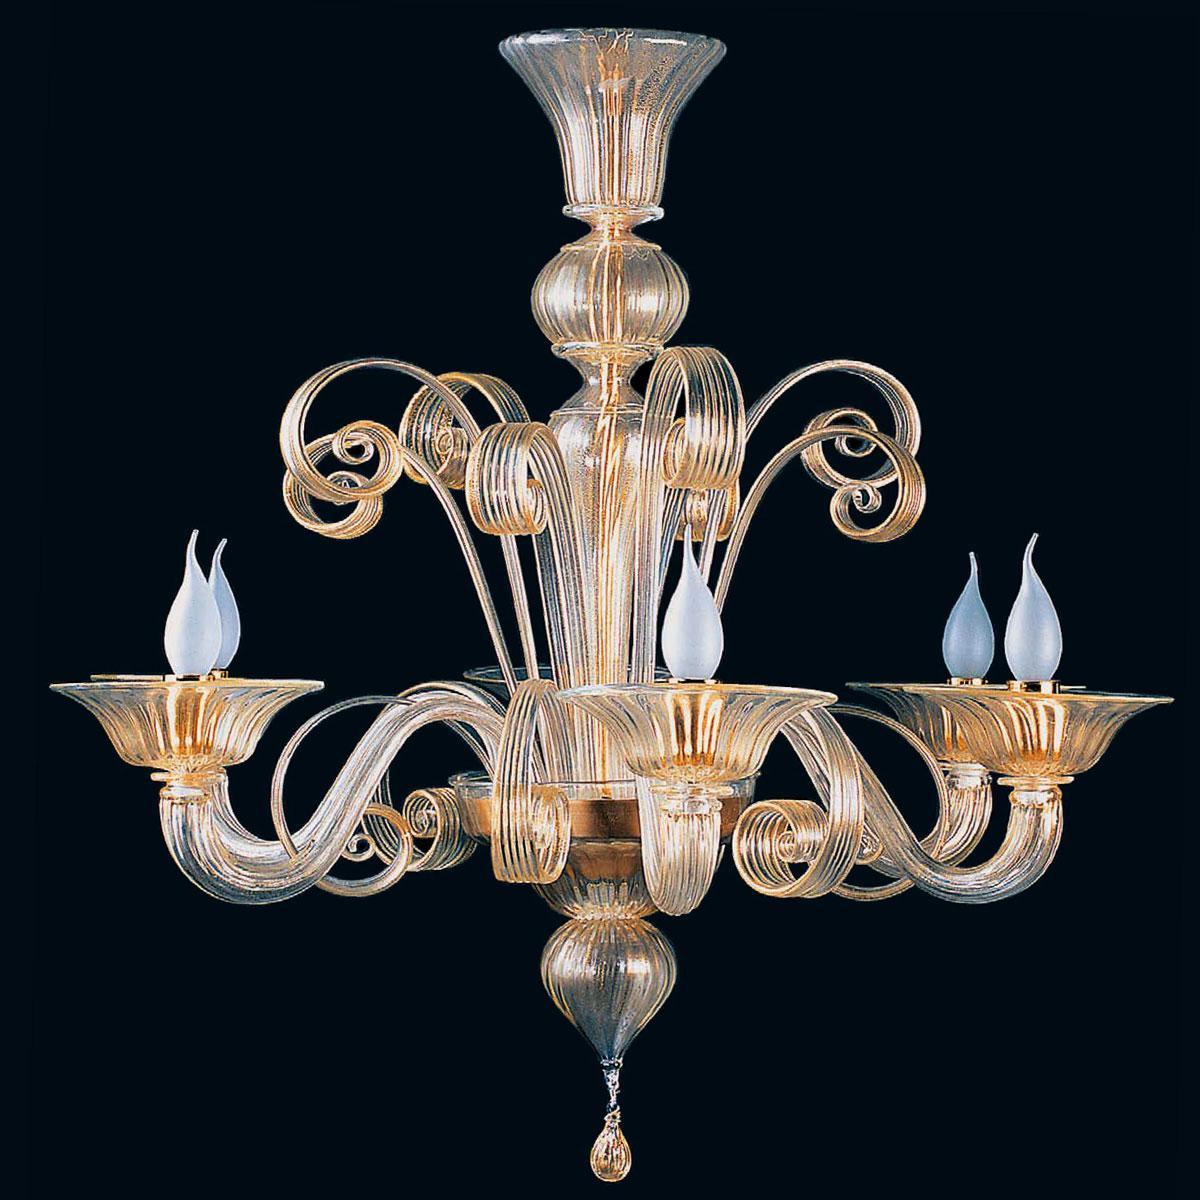 """Ima"" Murano glas Kronleuchter - 6 flammig - gold"